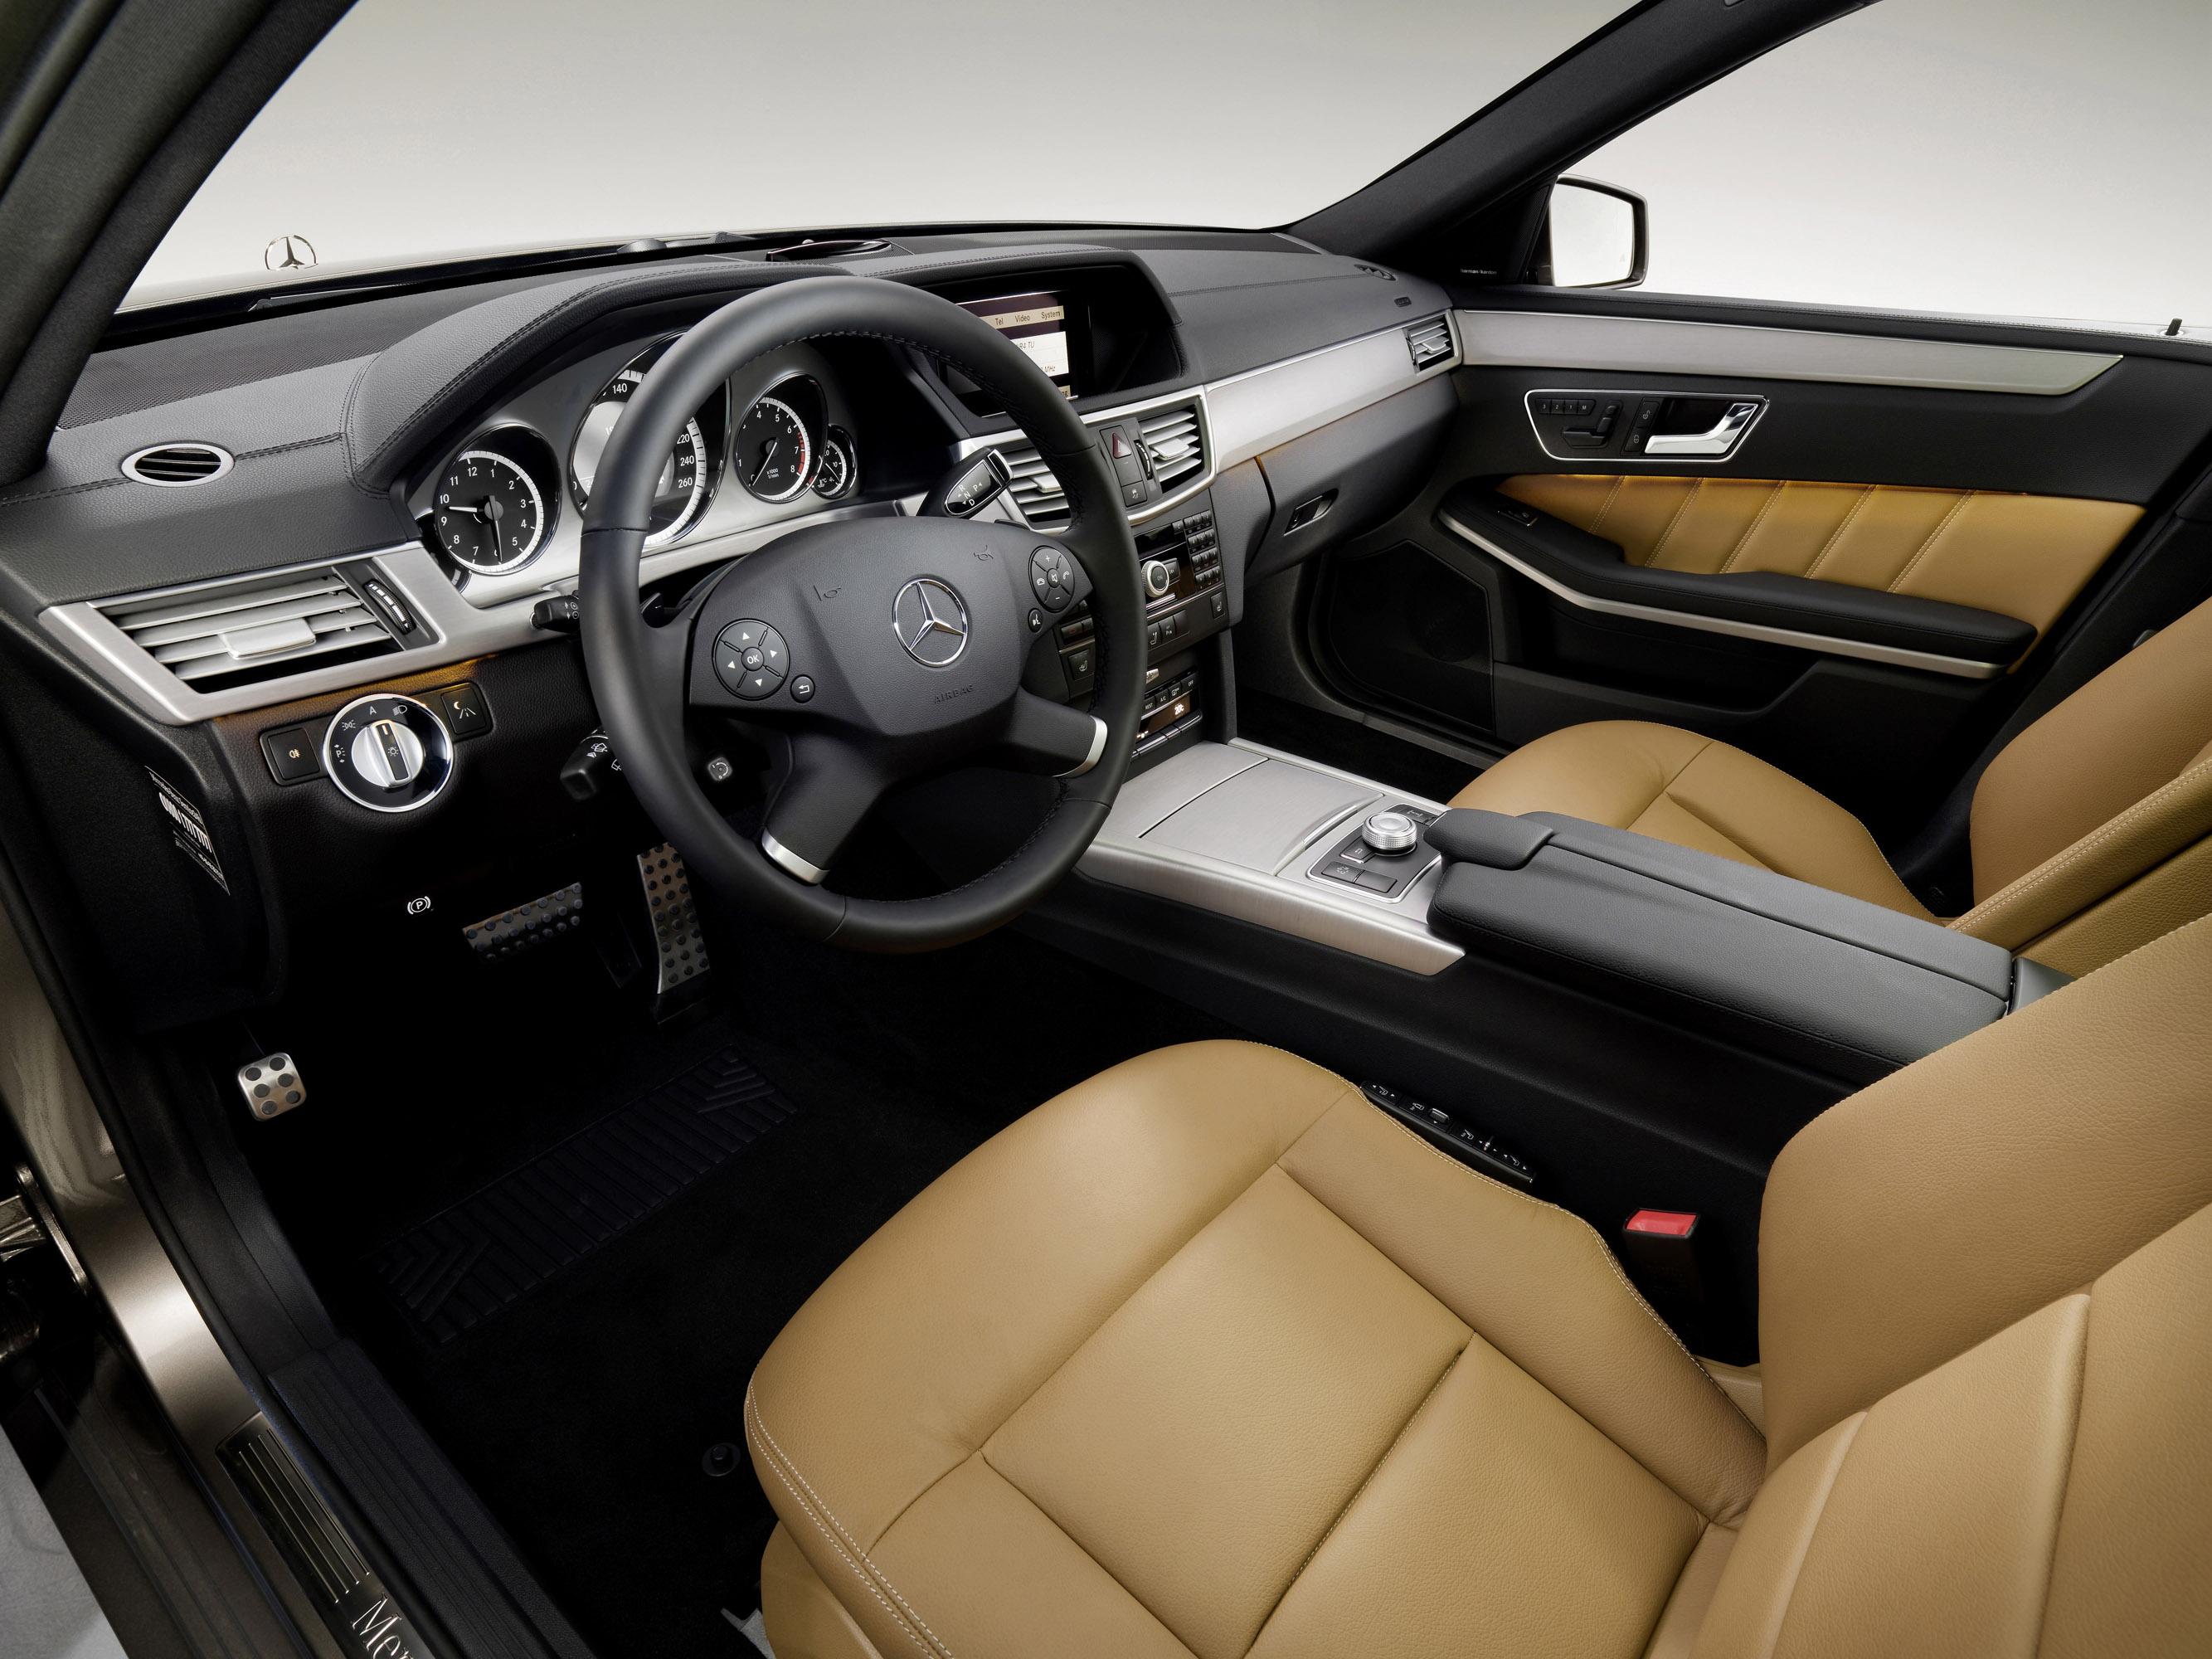 Mercedes-Benz E-Class Универсал - фотография №3